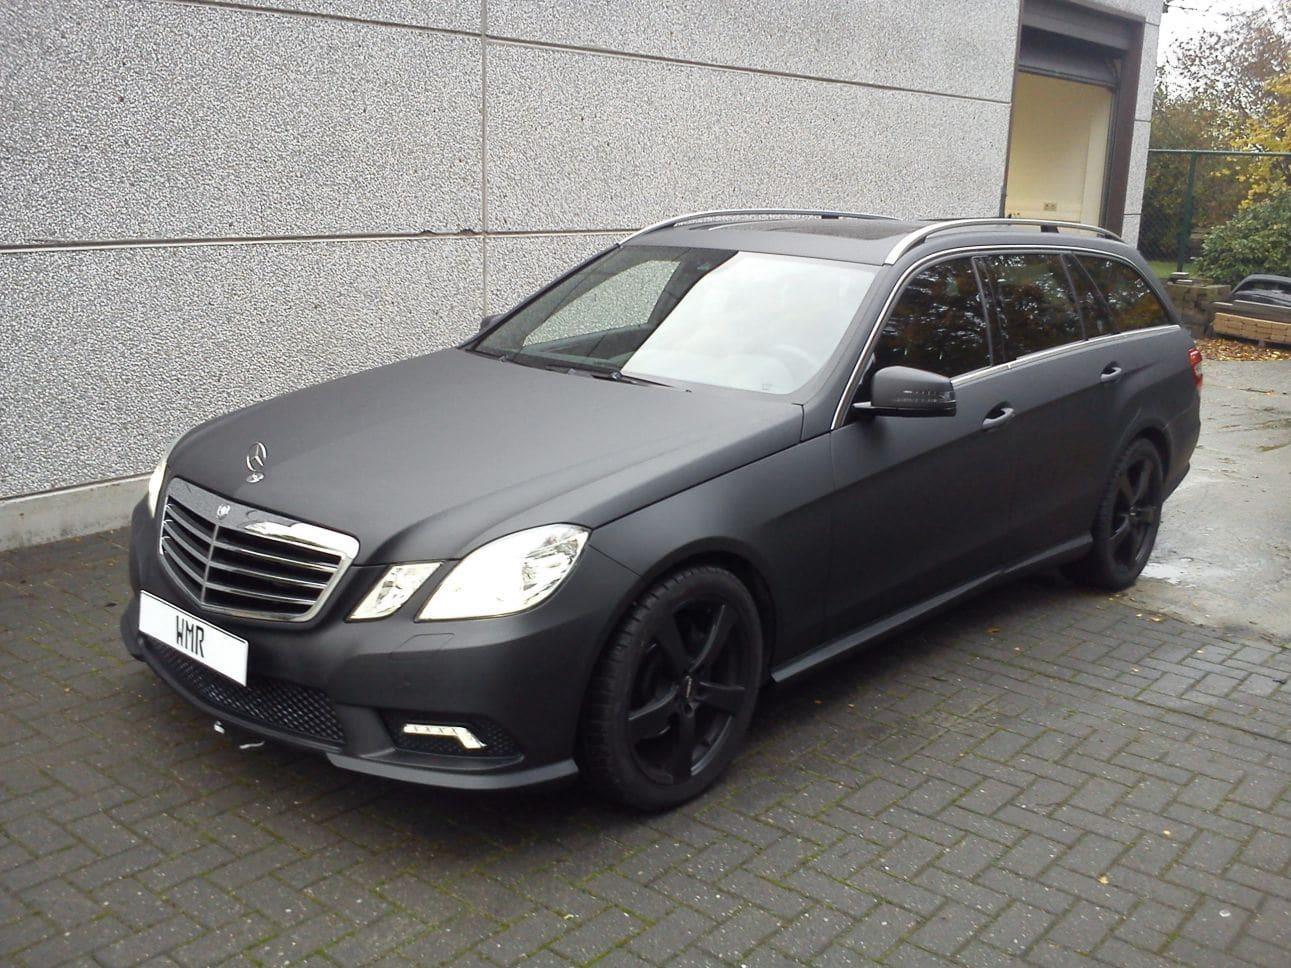 Mercedes E320 met Mat Zwarte Wrap, Carwrapping door Wrapmyride.nu Foto-nr:6227, ©2021